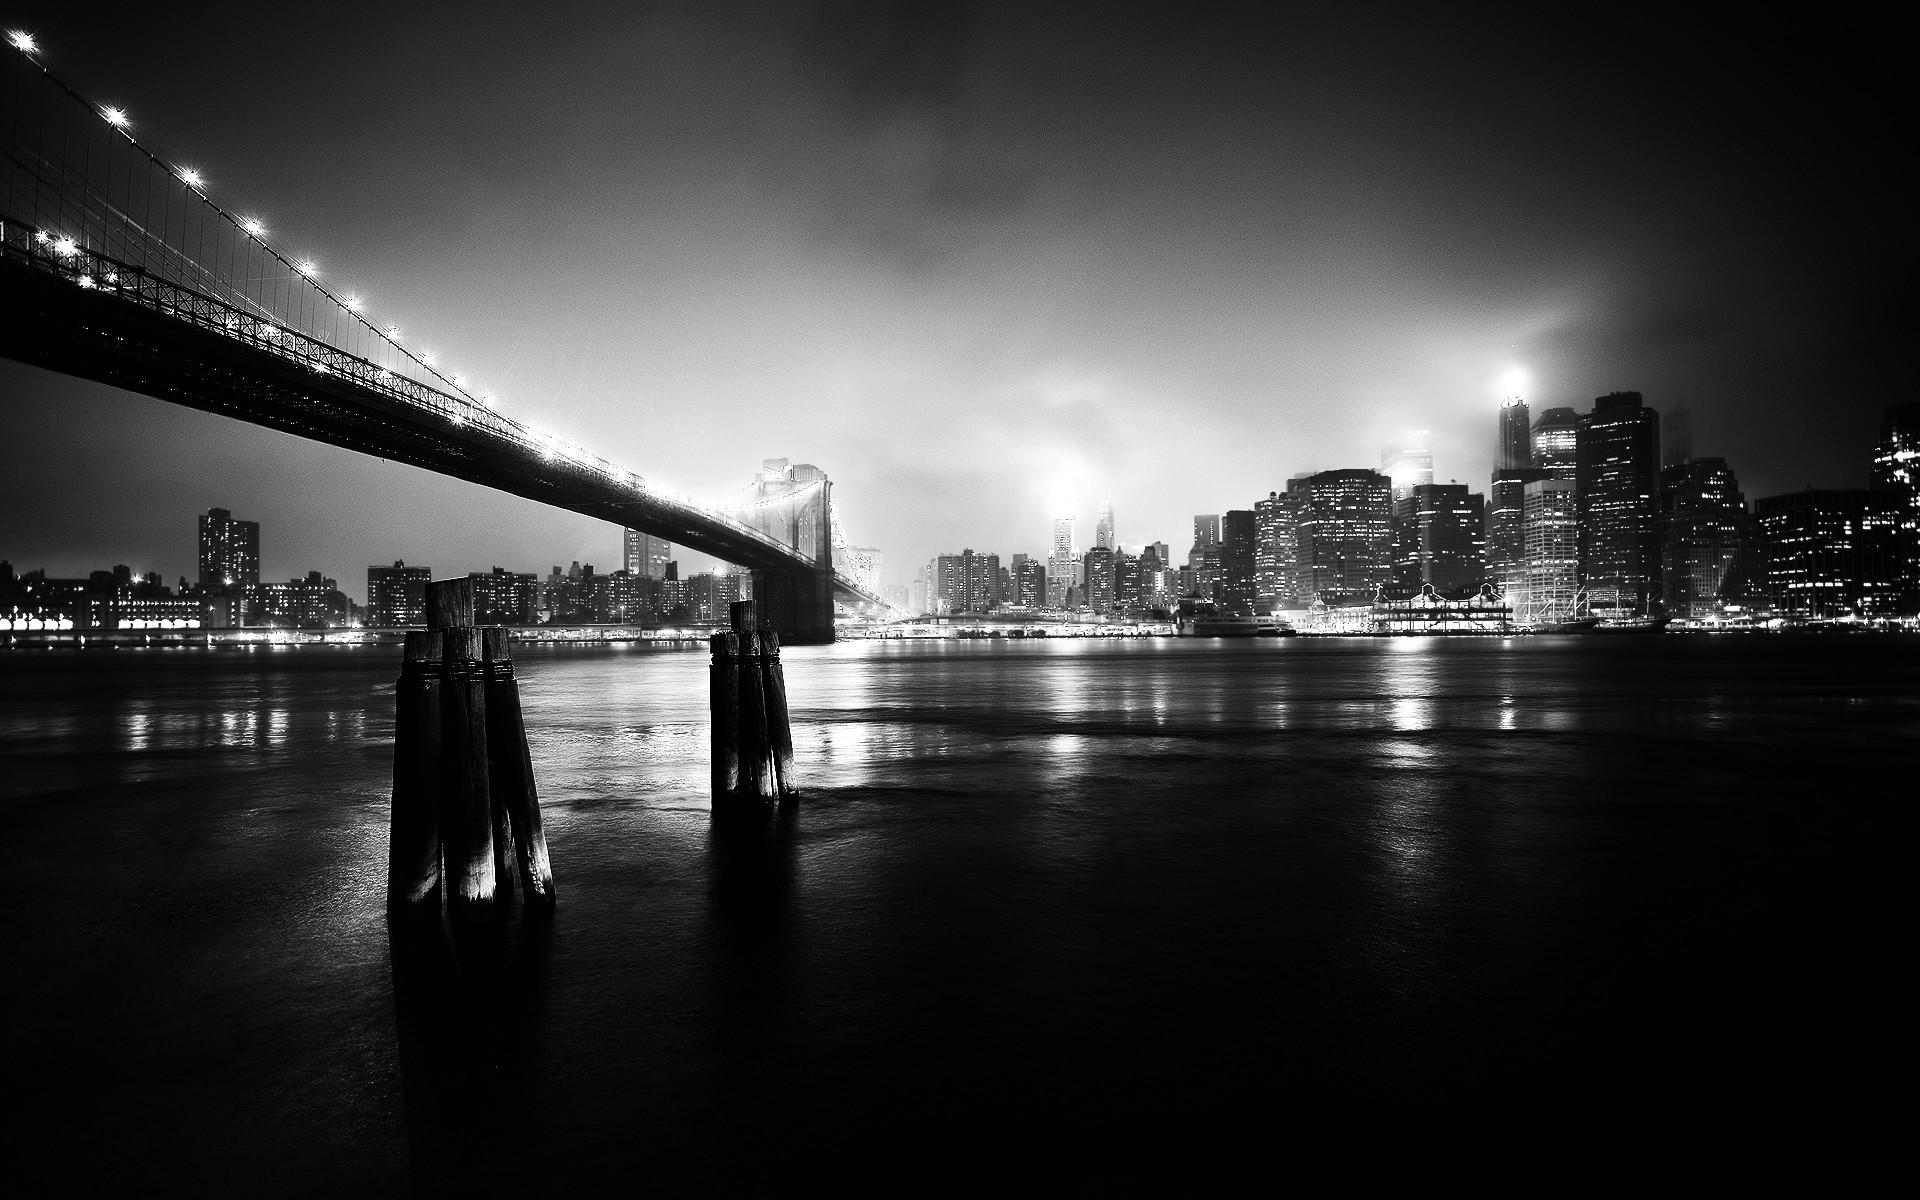 Brooklyn bridge hd wallpaper wallpapersafari - Bridge wallpaper hd ...